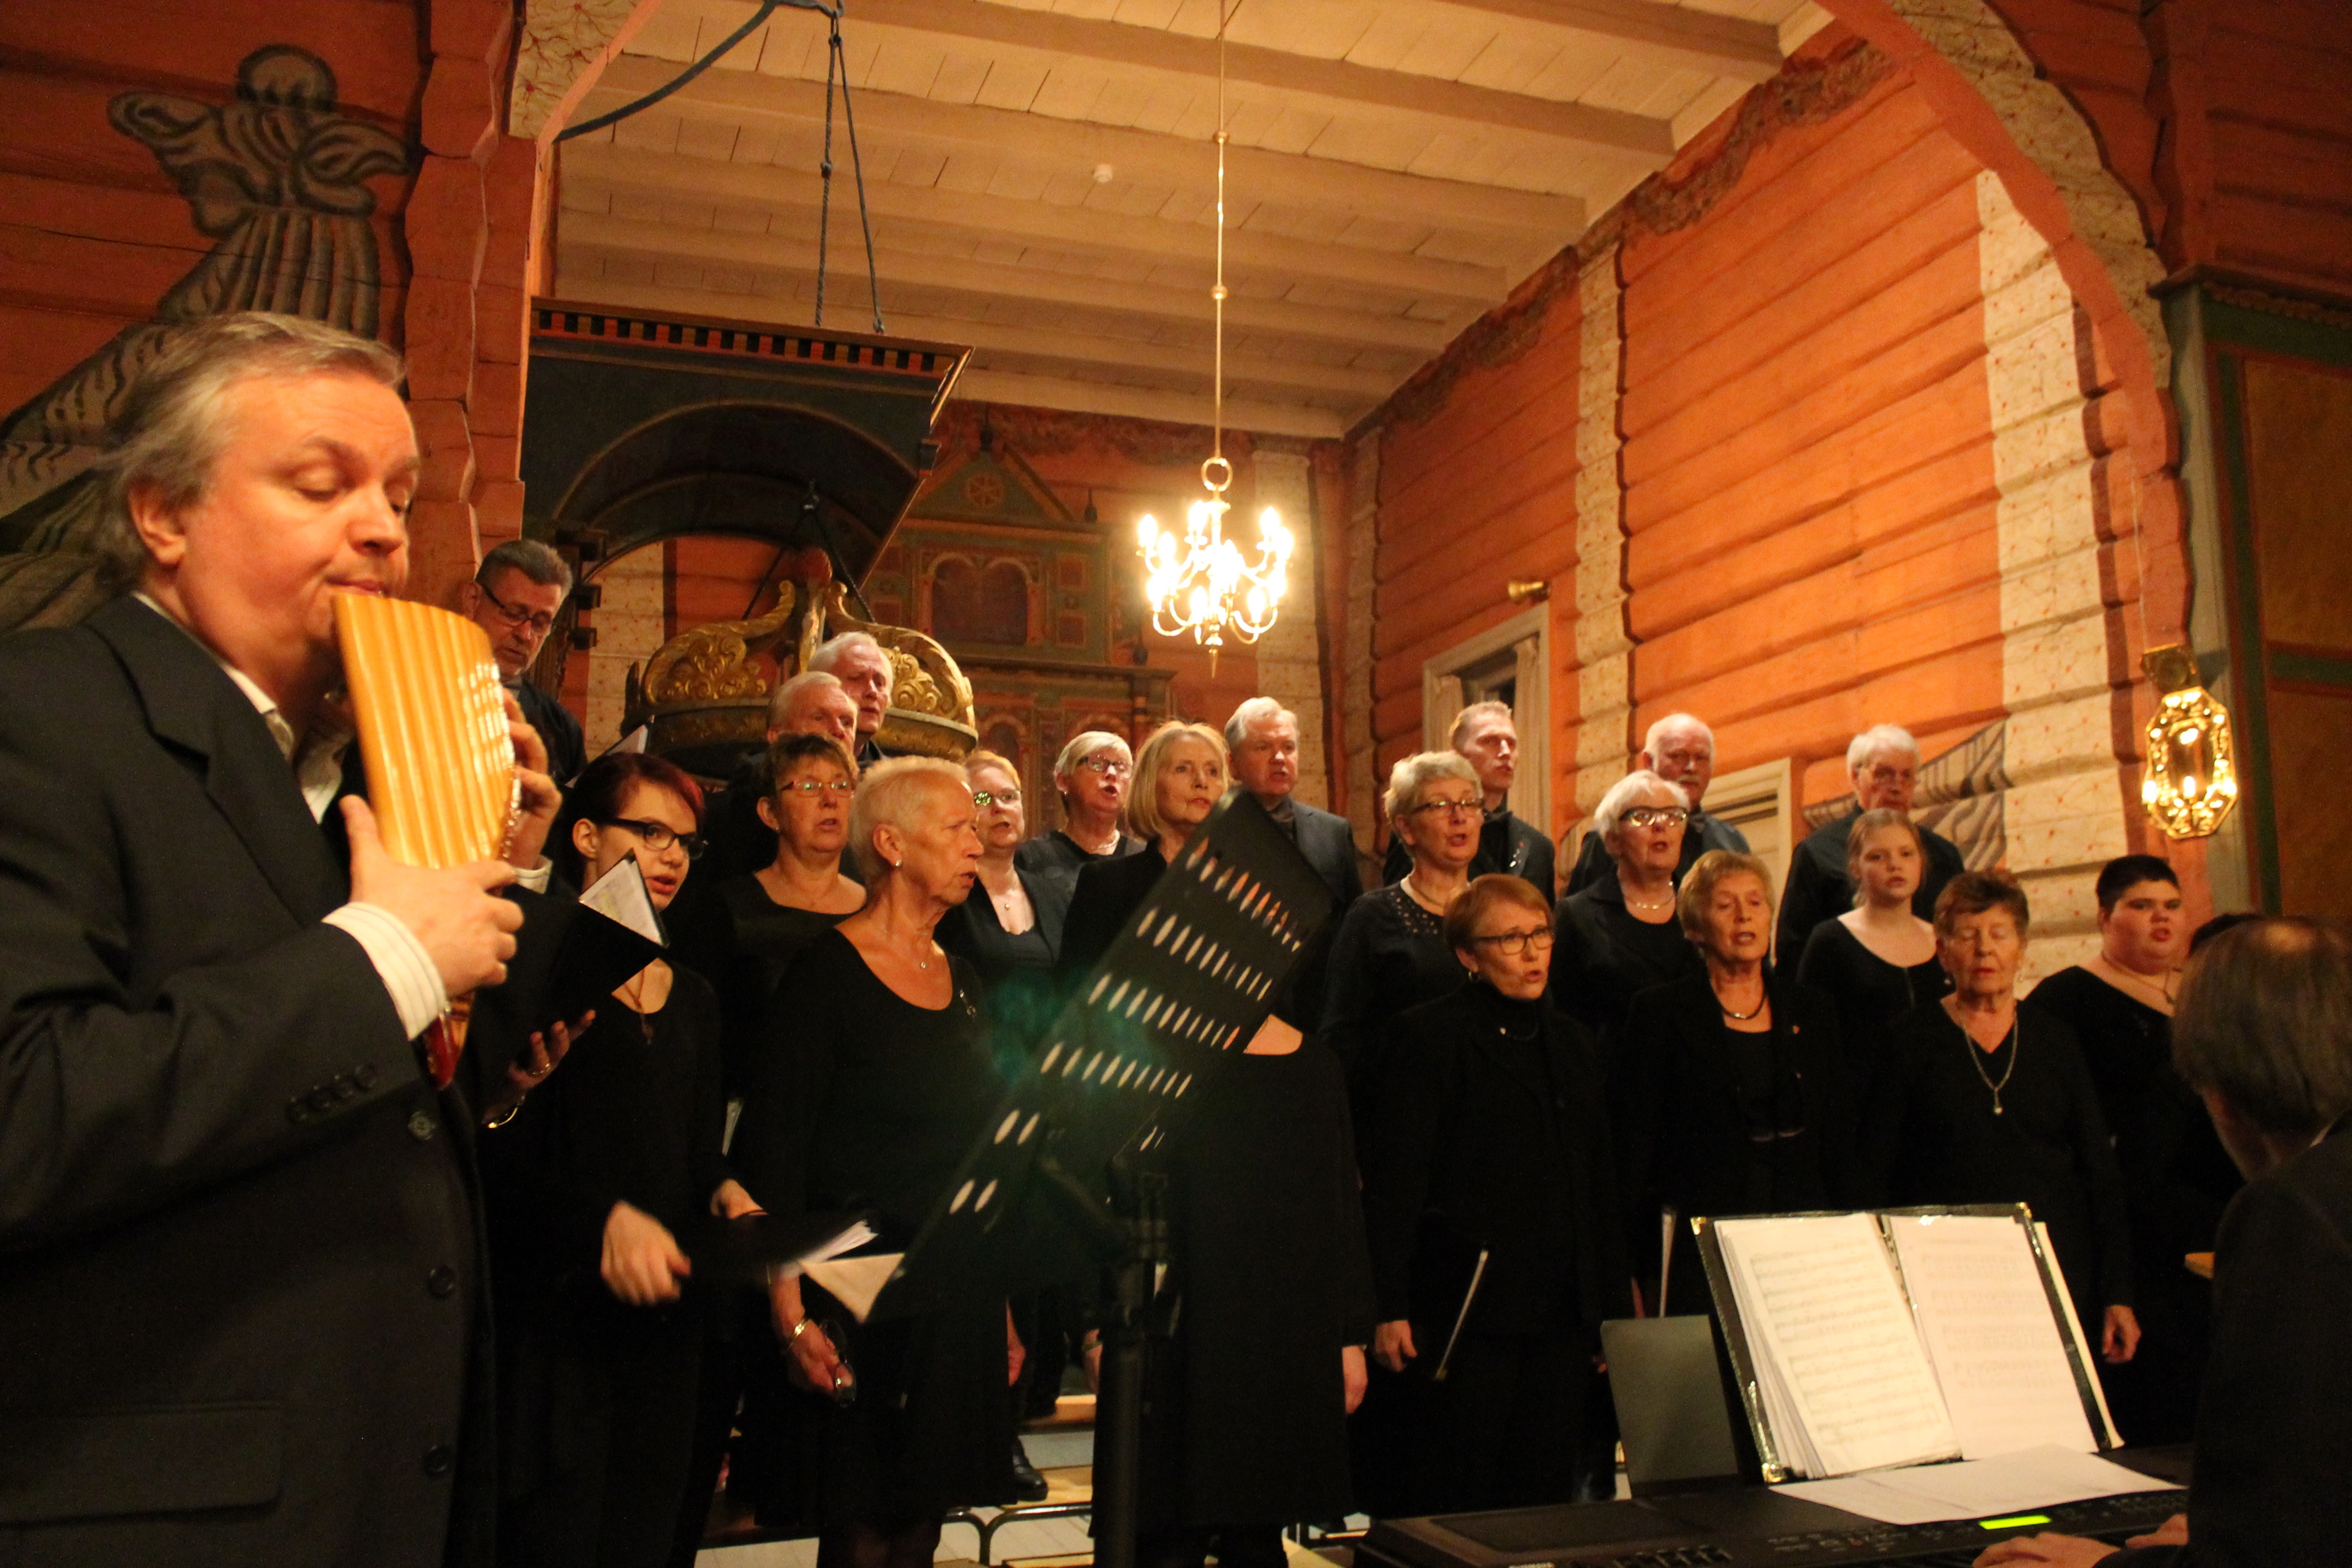 11 Konsert med Roar Engelberg Svarstad kirke 13.03.15 - 9021